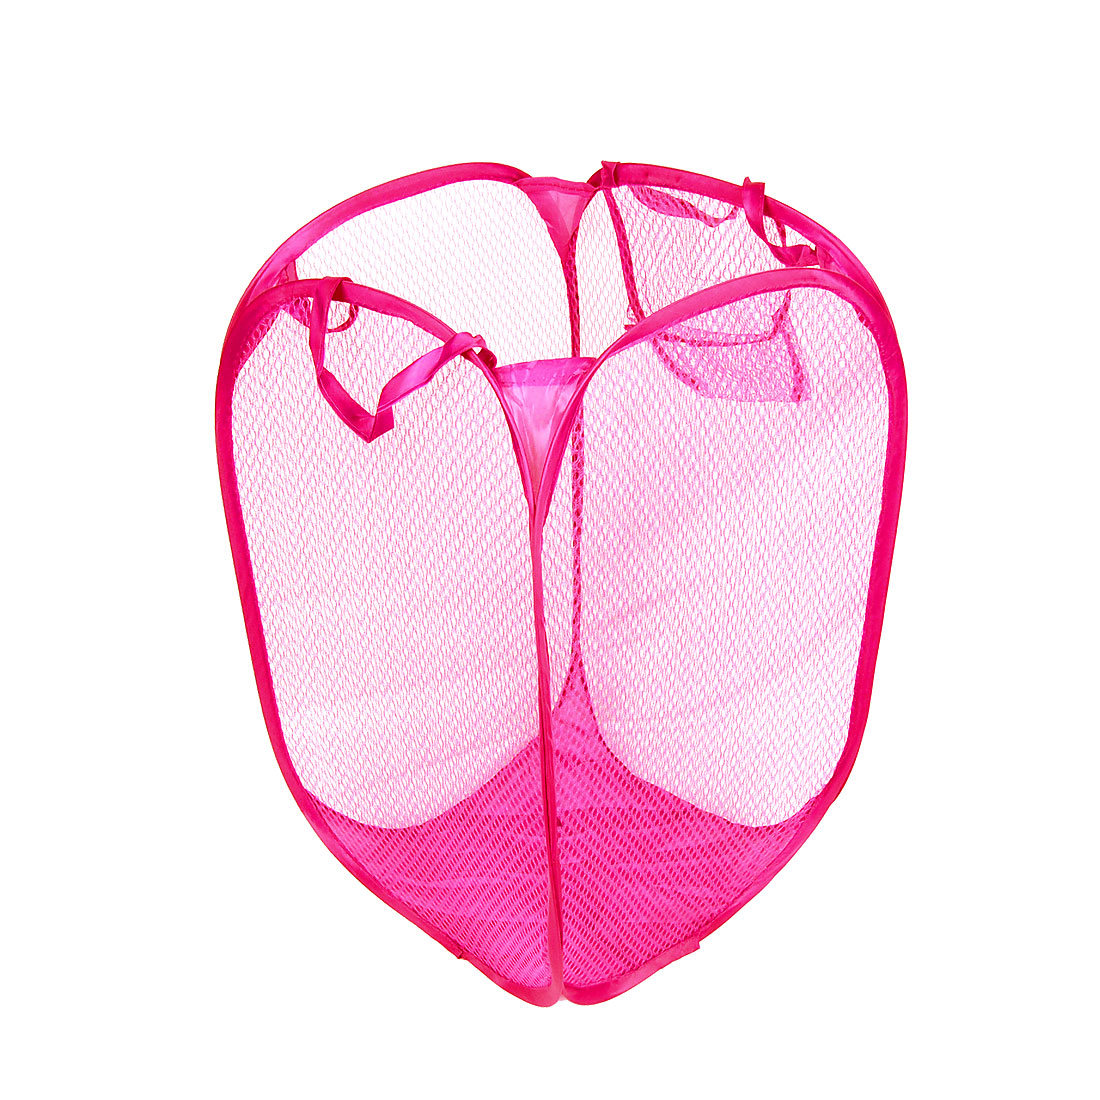 Foldable Fuchsia Mesh Design Clothes Storage Laundry Basket Hamper